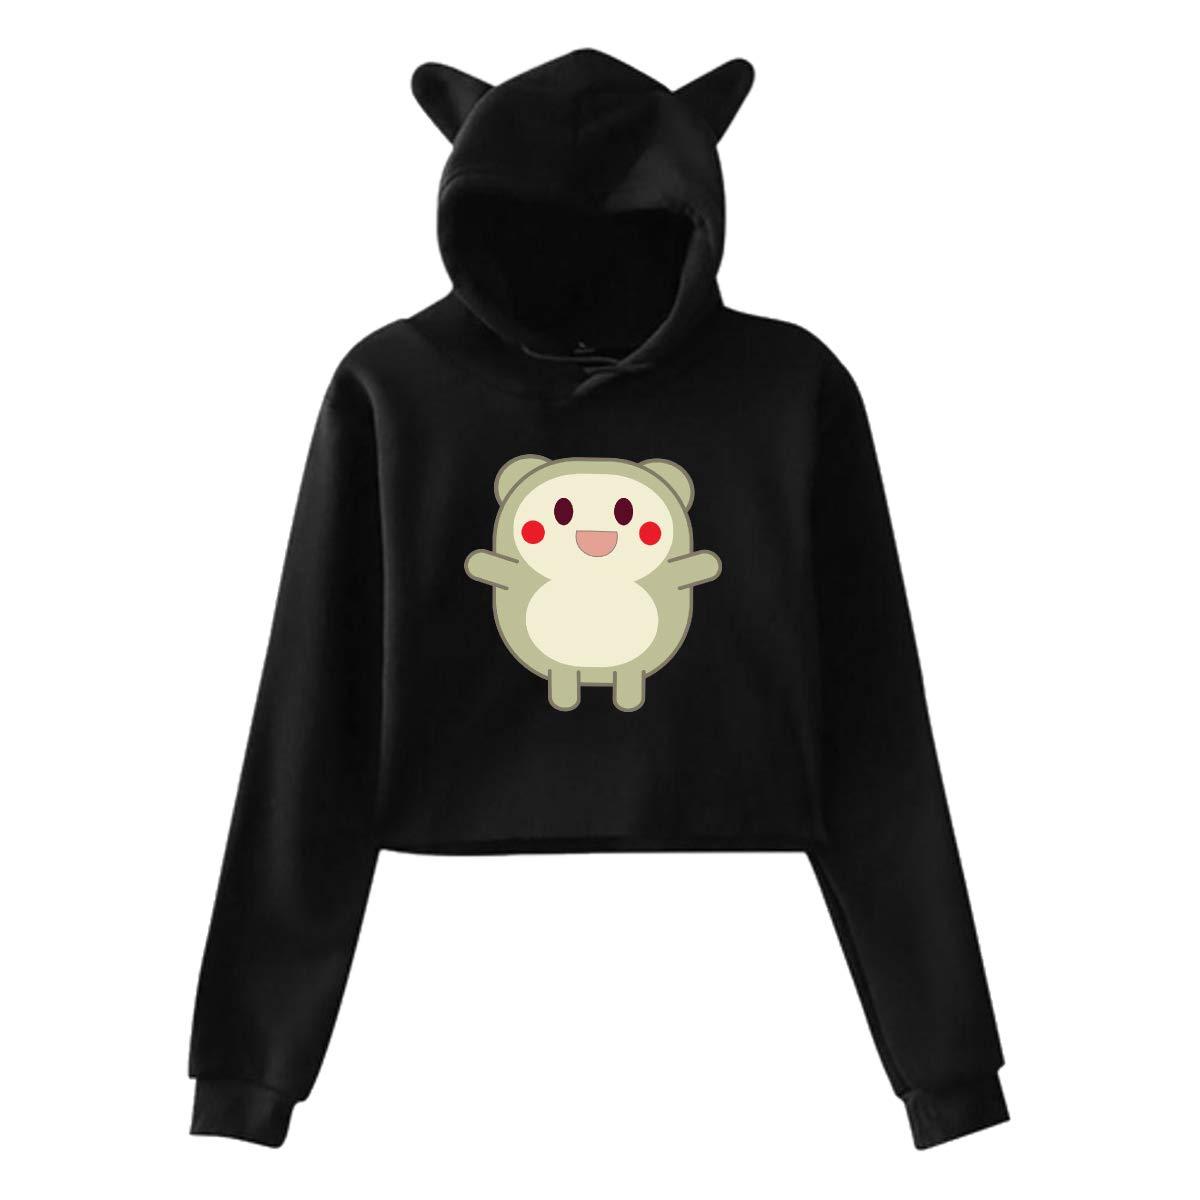 Womens Long Sleeve Crop Top Hoodies Cute Critter Cat Ear Lumbar Hoodie Pullover Sweater